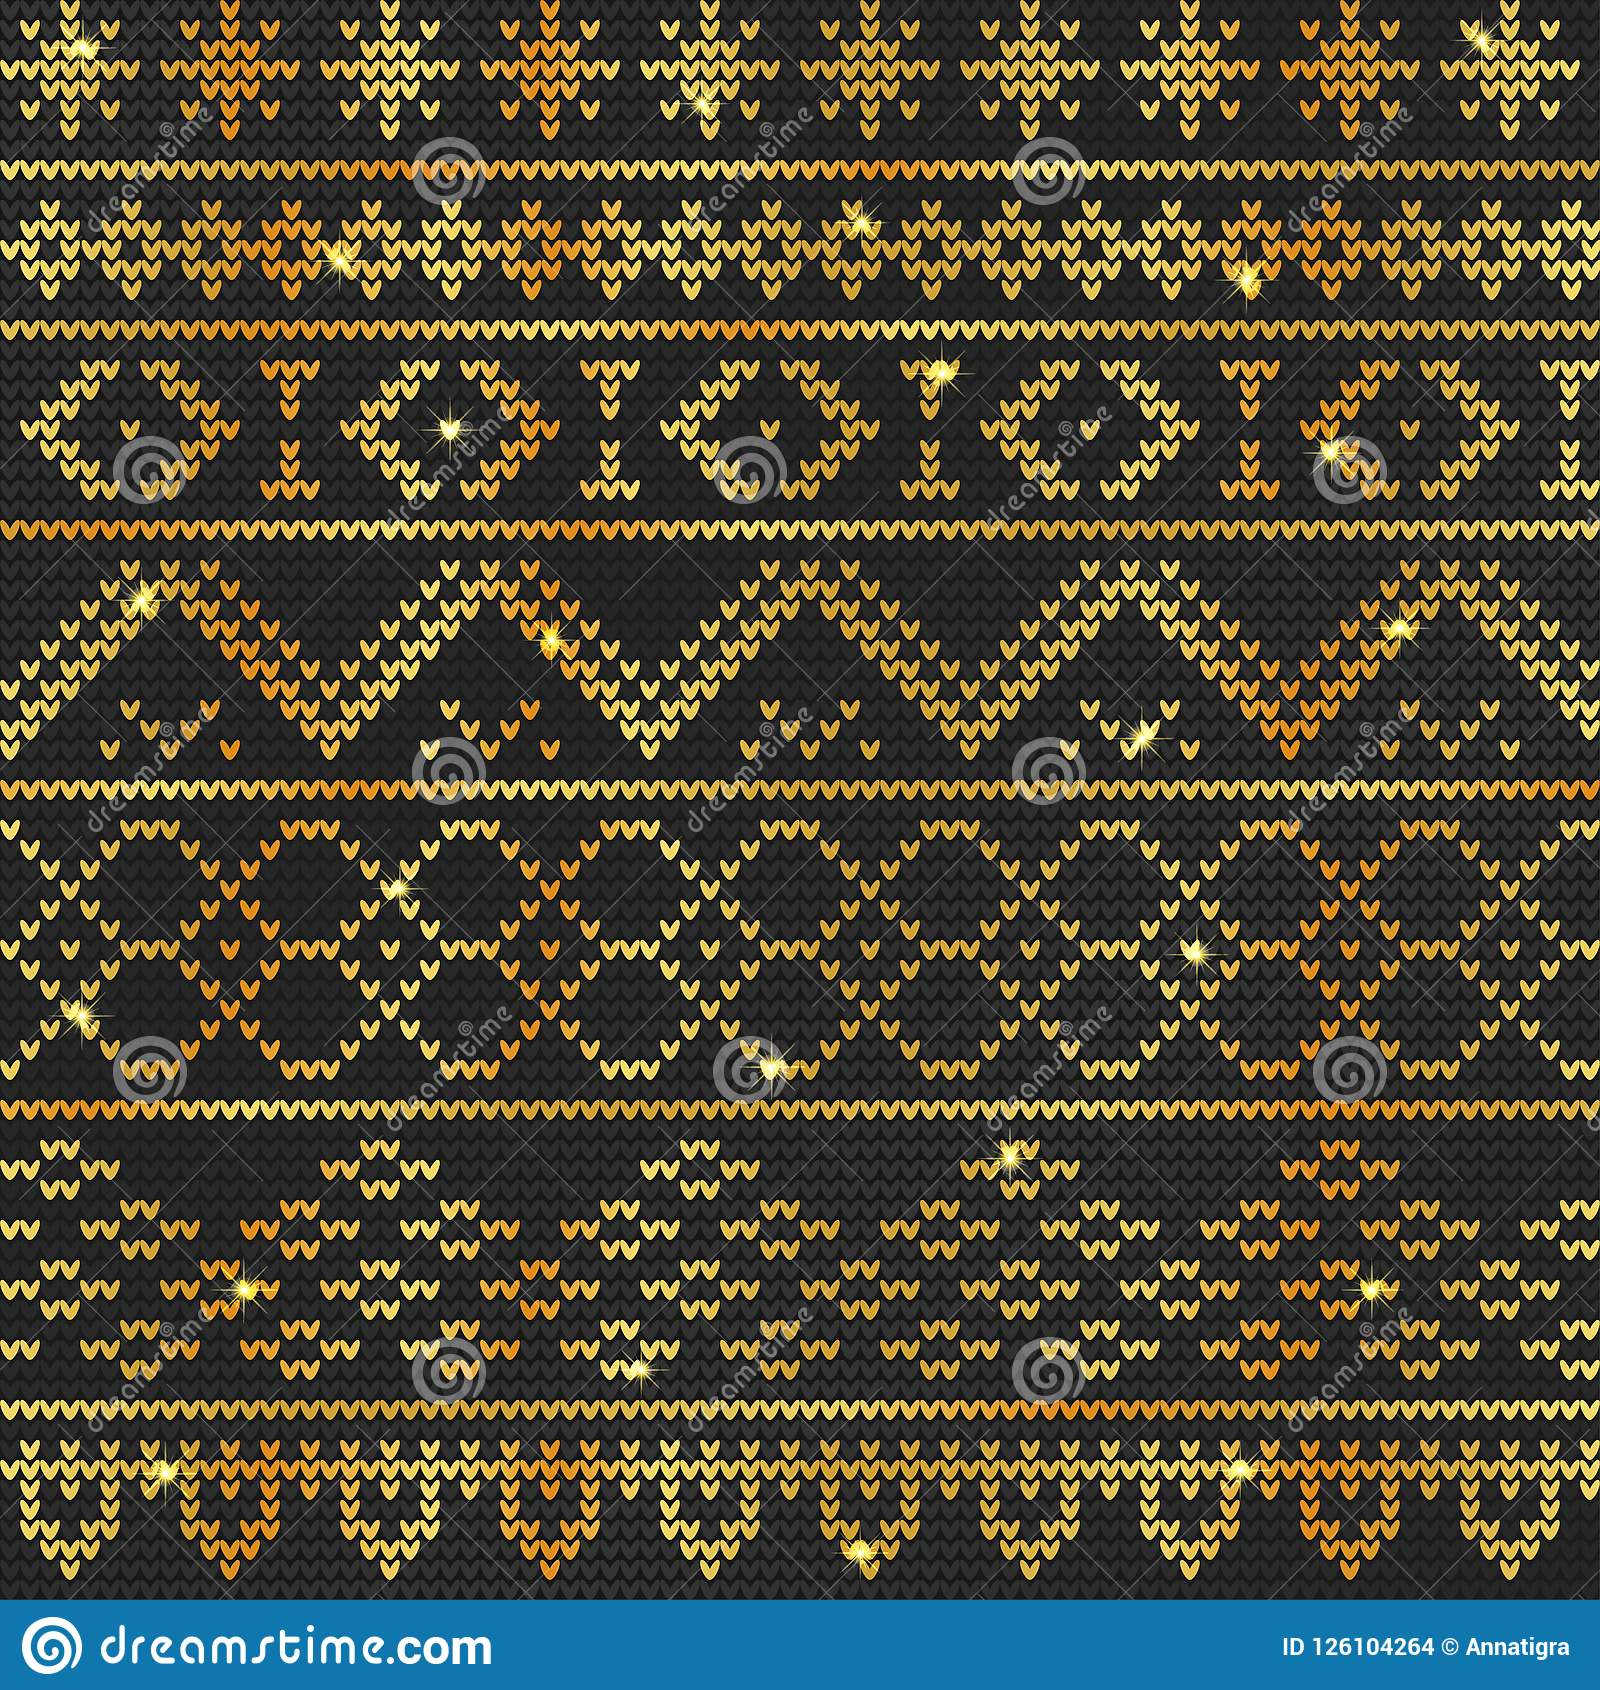 de30b69ad2b0 Ugly sweater Pattern stock vector. Illustration of jumper - 126104264